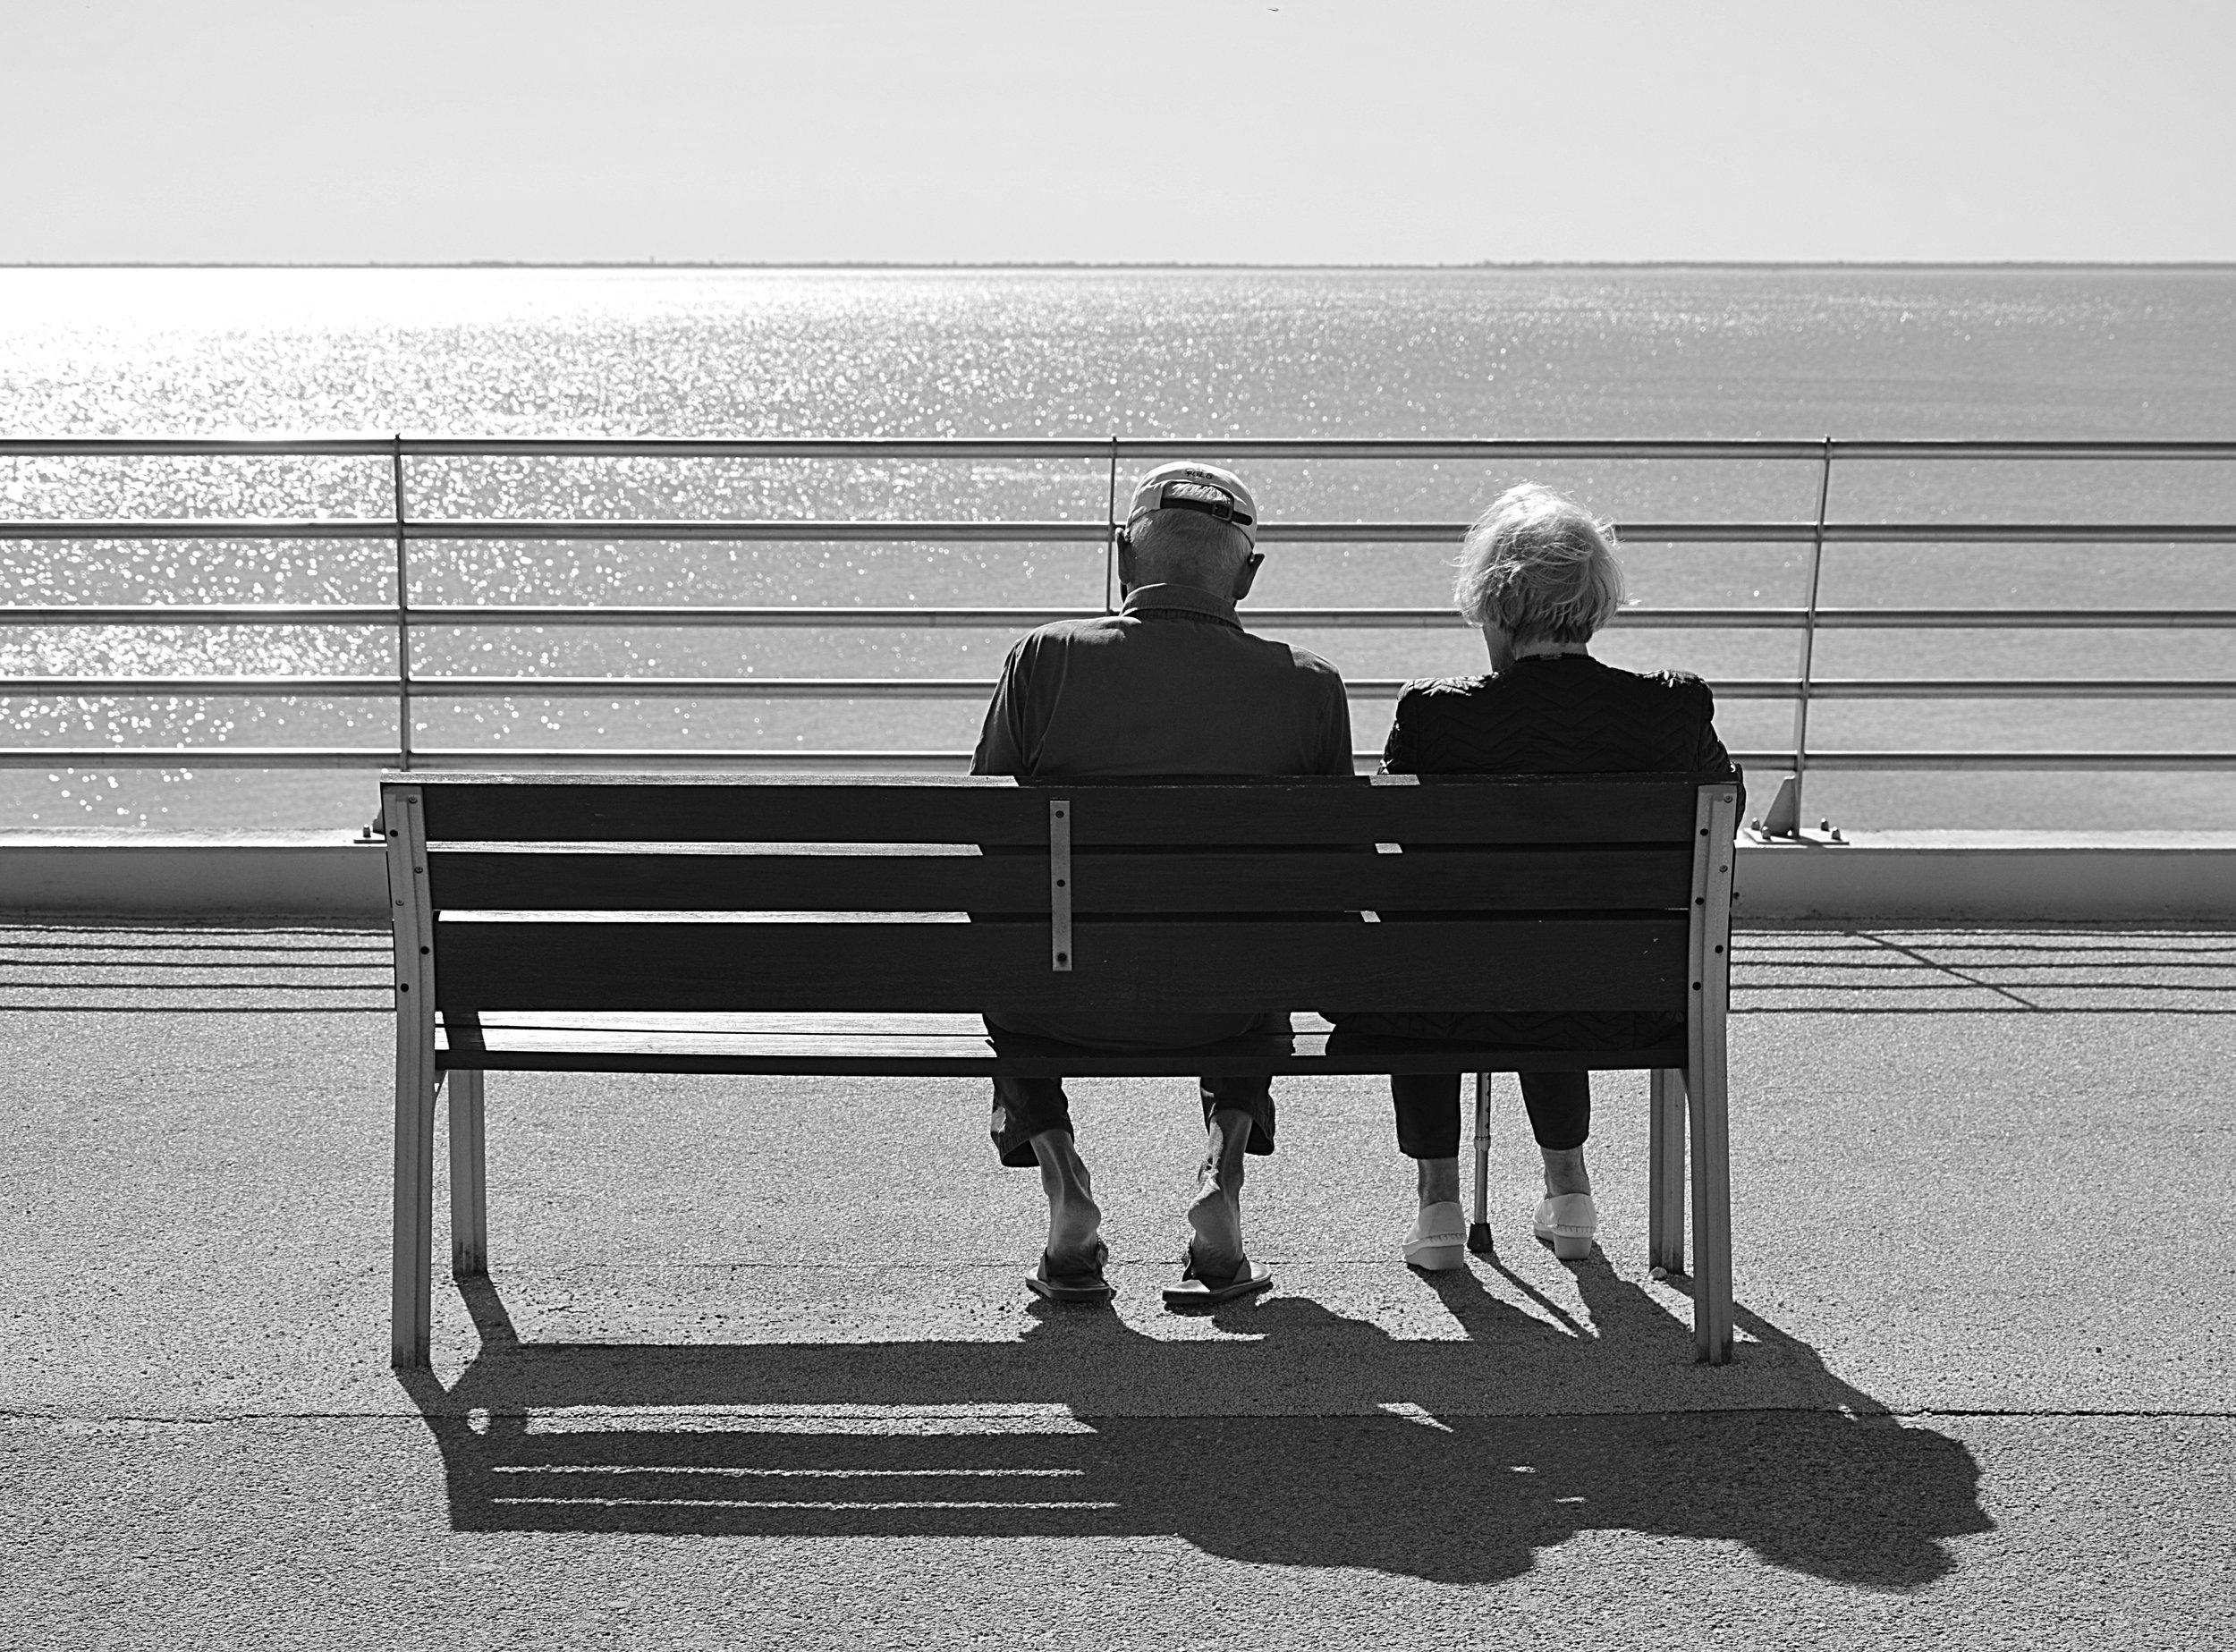 couple-3113574.jpg